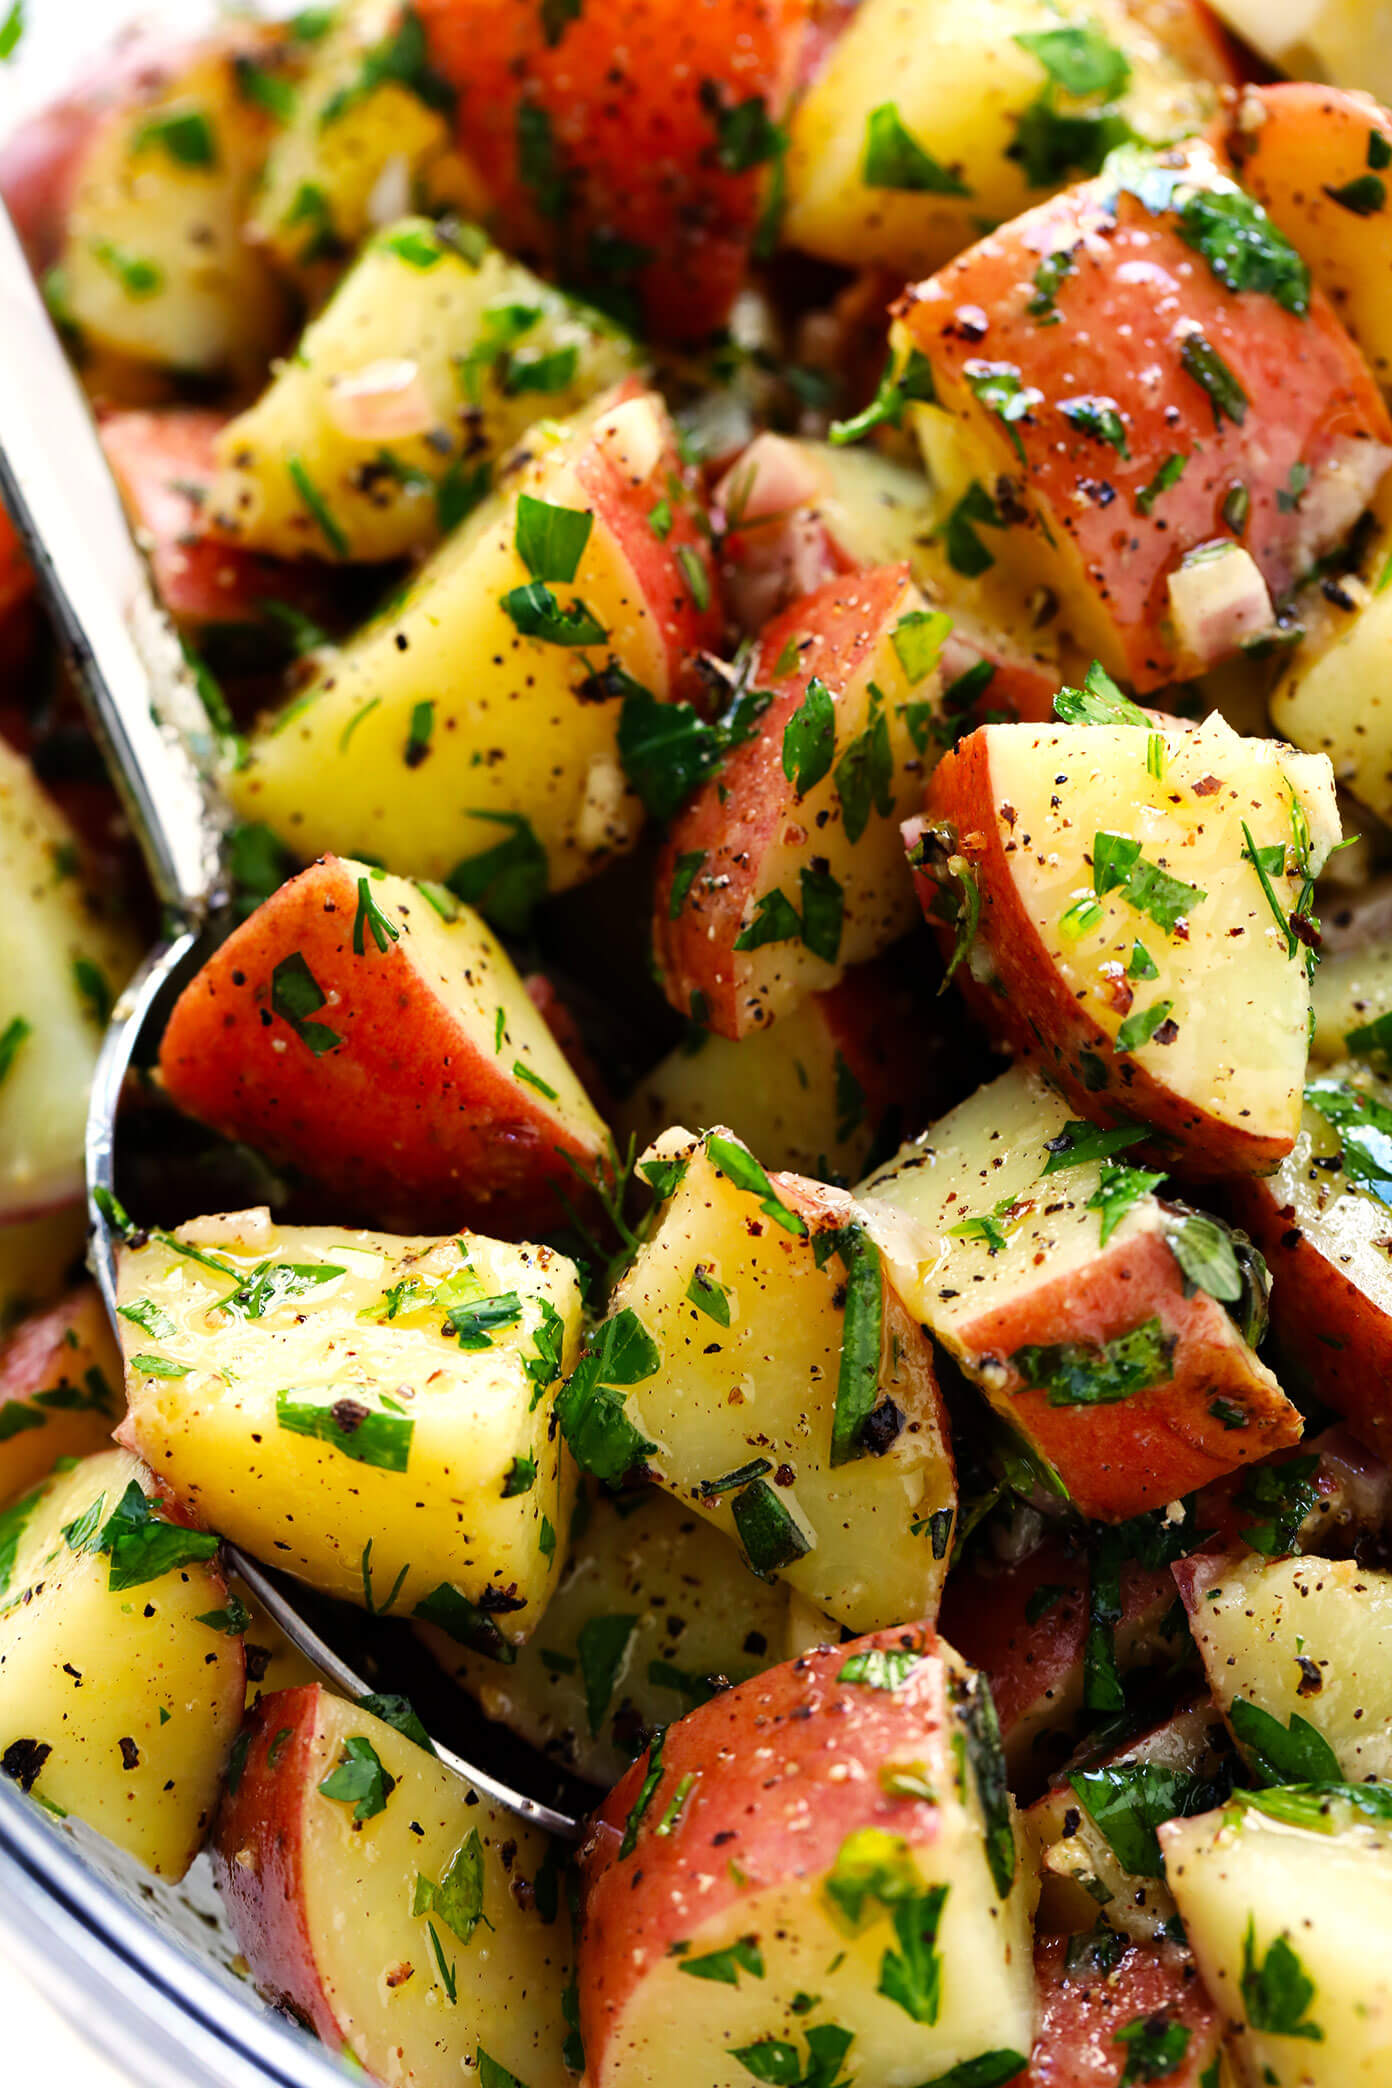 Lemon Herb Potato Salad Recipe (No Mayo)